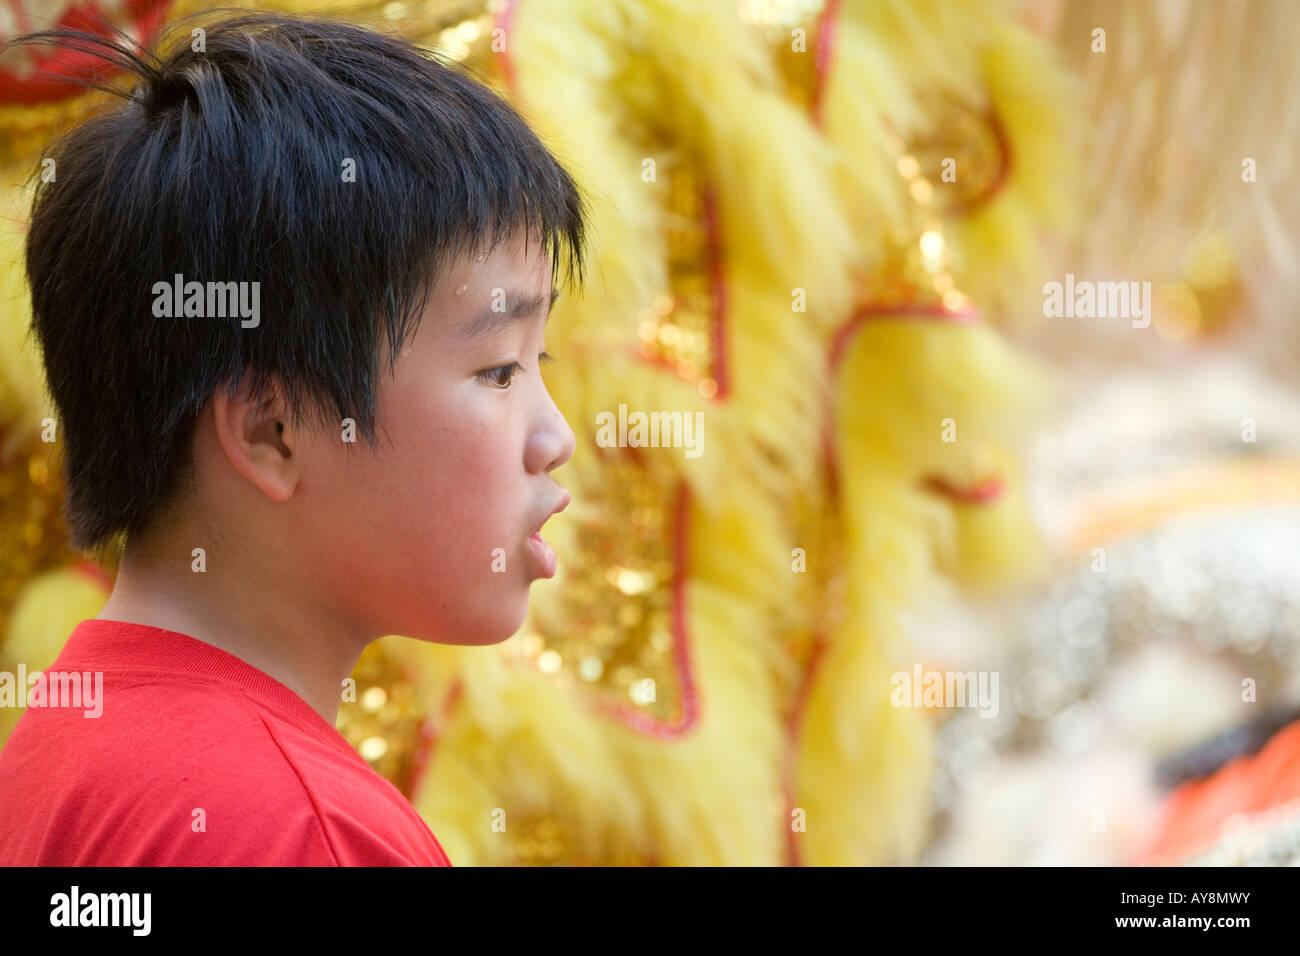 1997 2007 celebrations of the handover of Hong Kong back to China - Stock Image